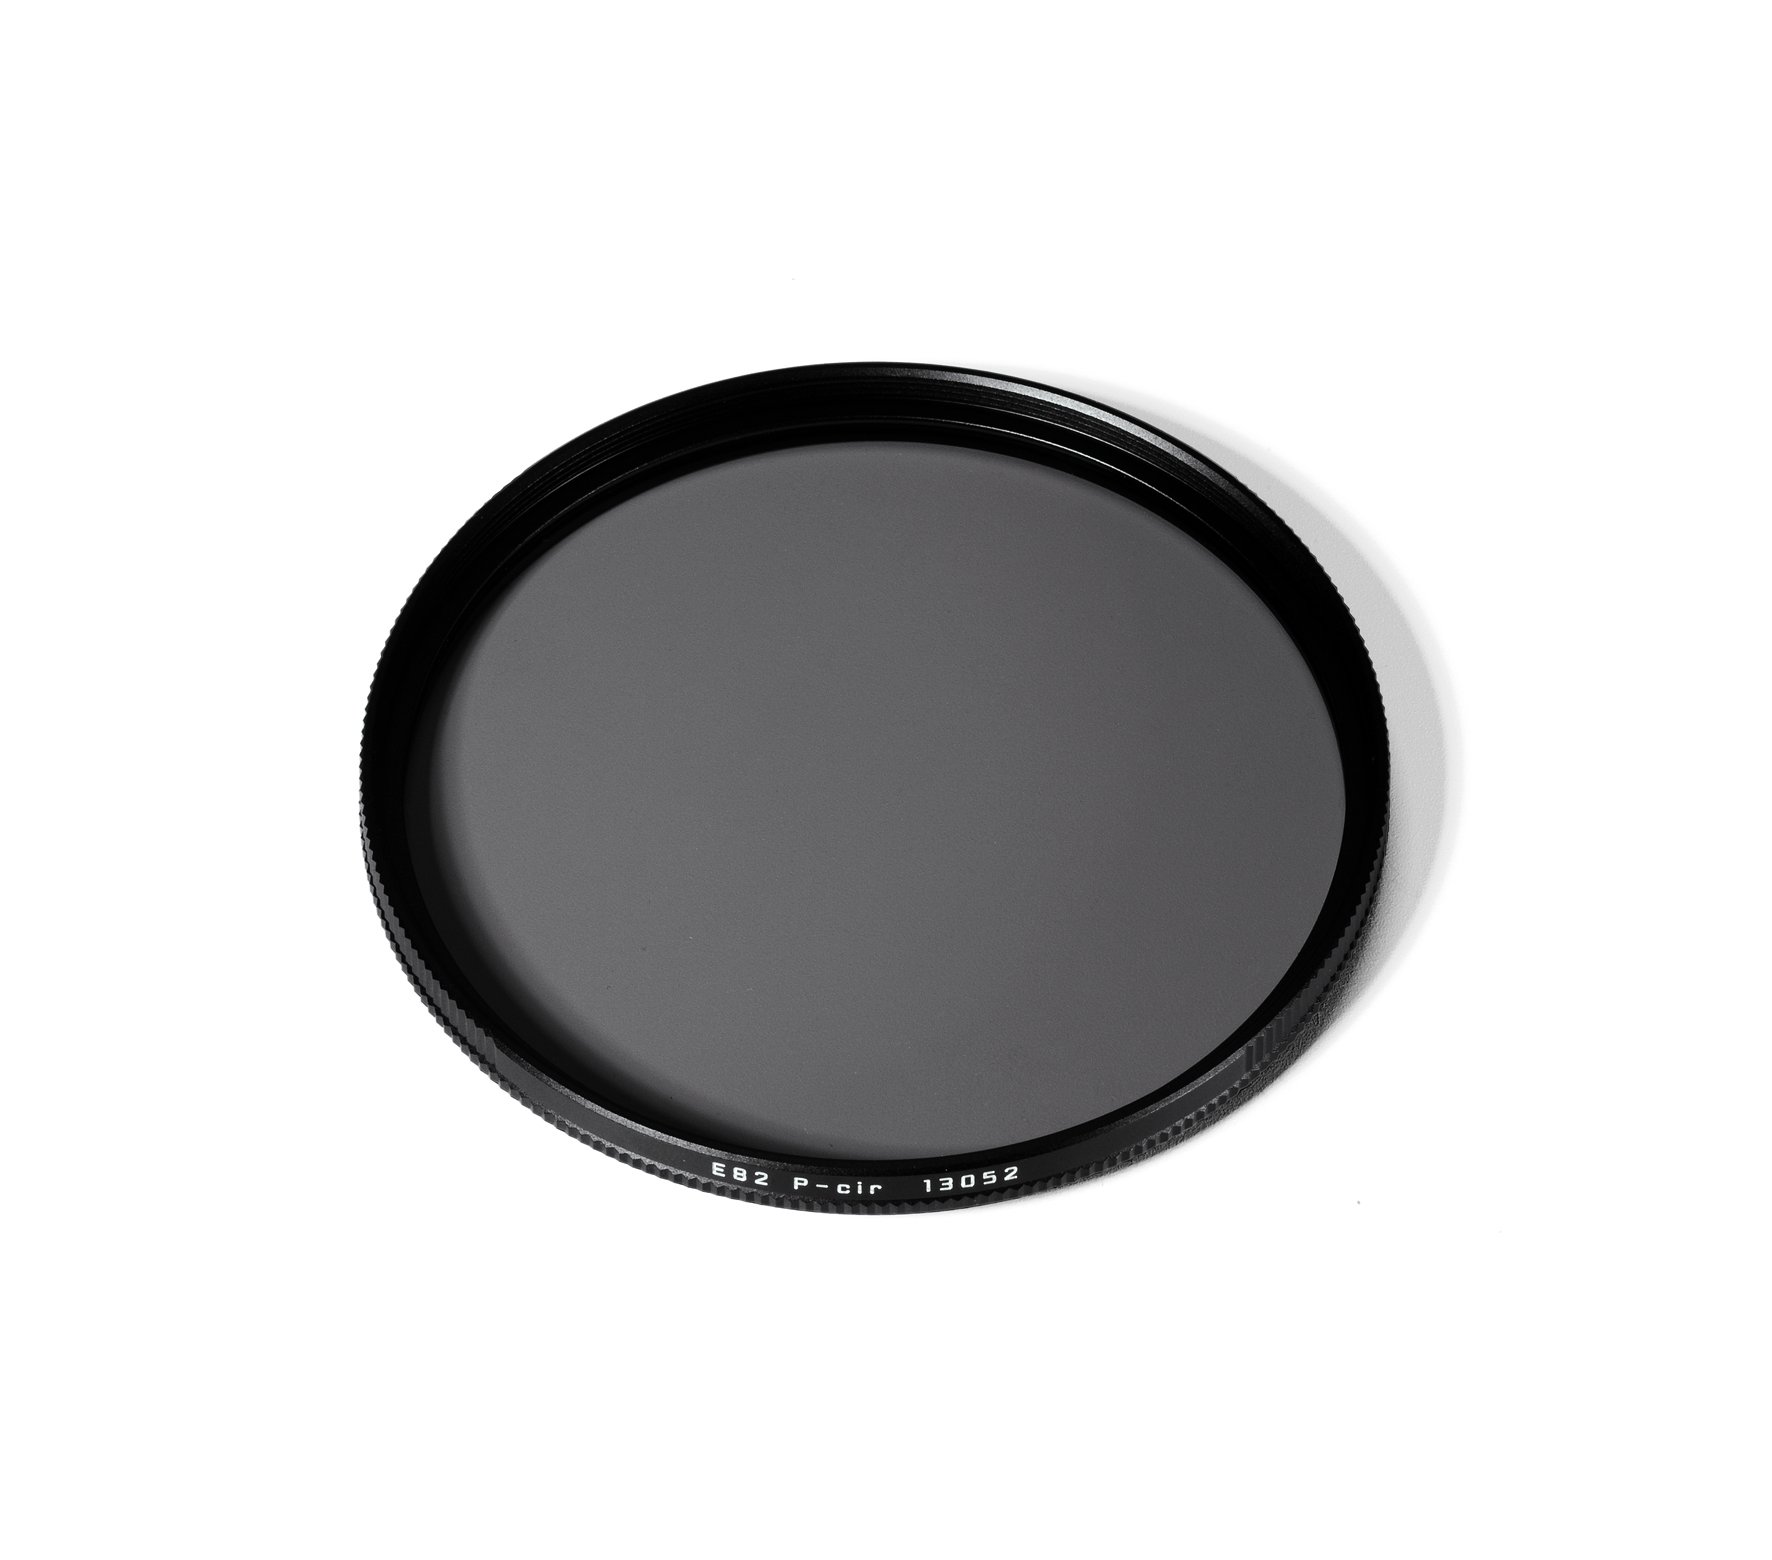 LEICA filtr polarizační 82 mm